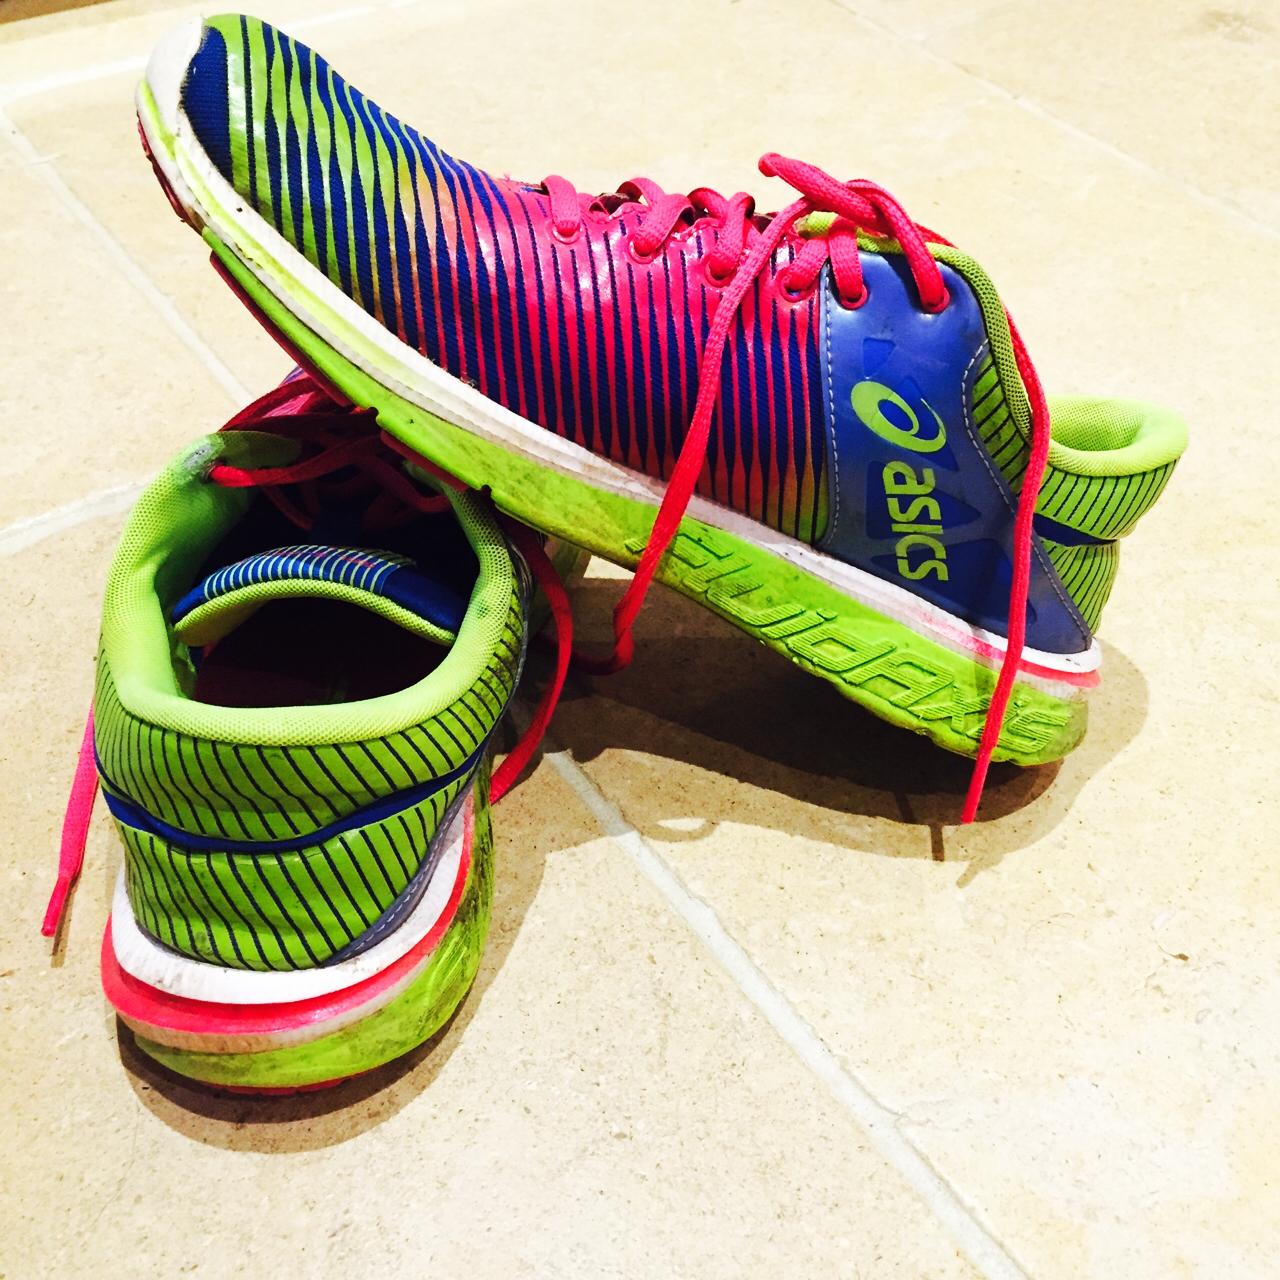 meilleur site web 59afb 1b875 MarathonHarry: Asics Gel-Super J33 | Running Shoe Review